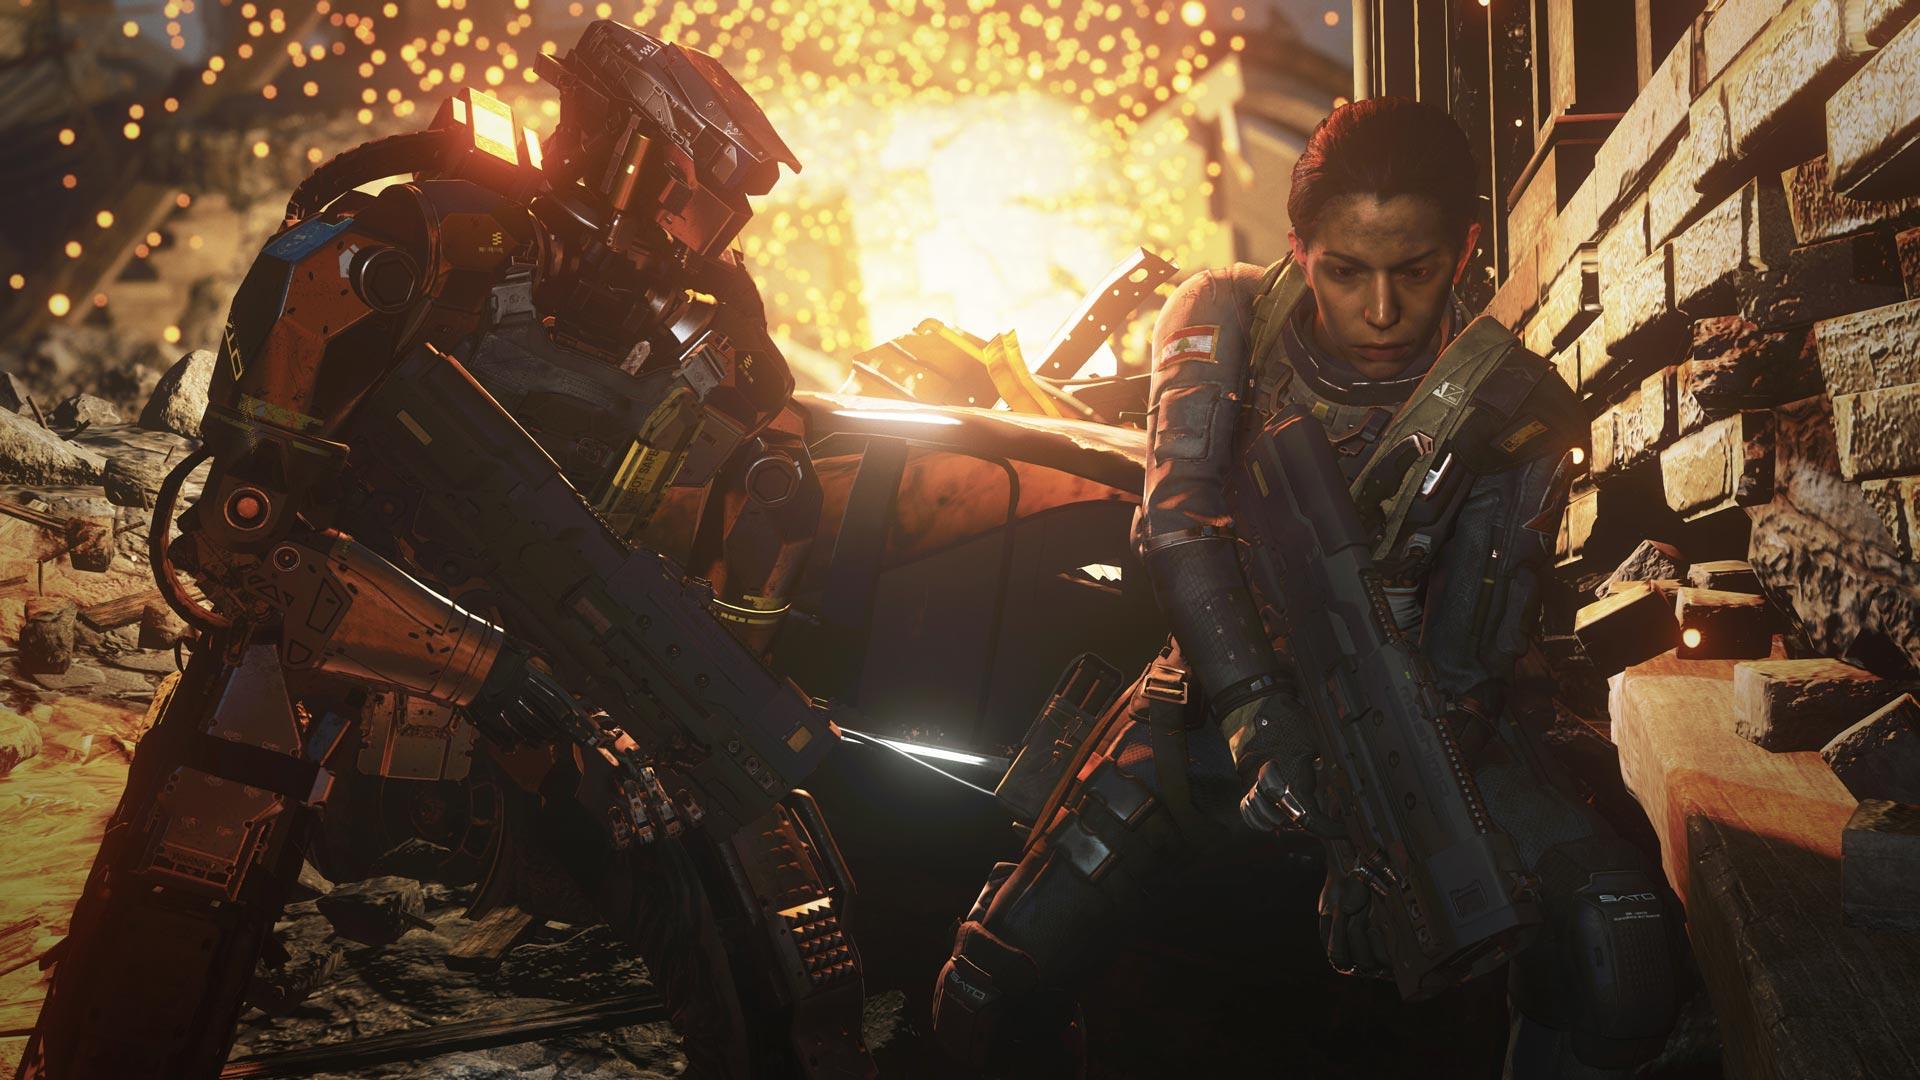 Call Of Duty Infinite Warfare ESPAÑOL Descargar Full + Update v20161118 (RELOADED) + REPACK 11 DVD5 (JPW) 1